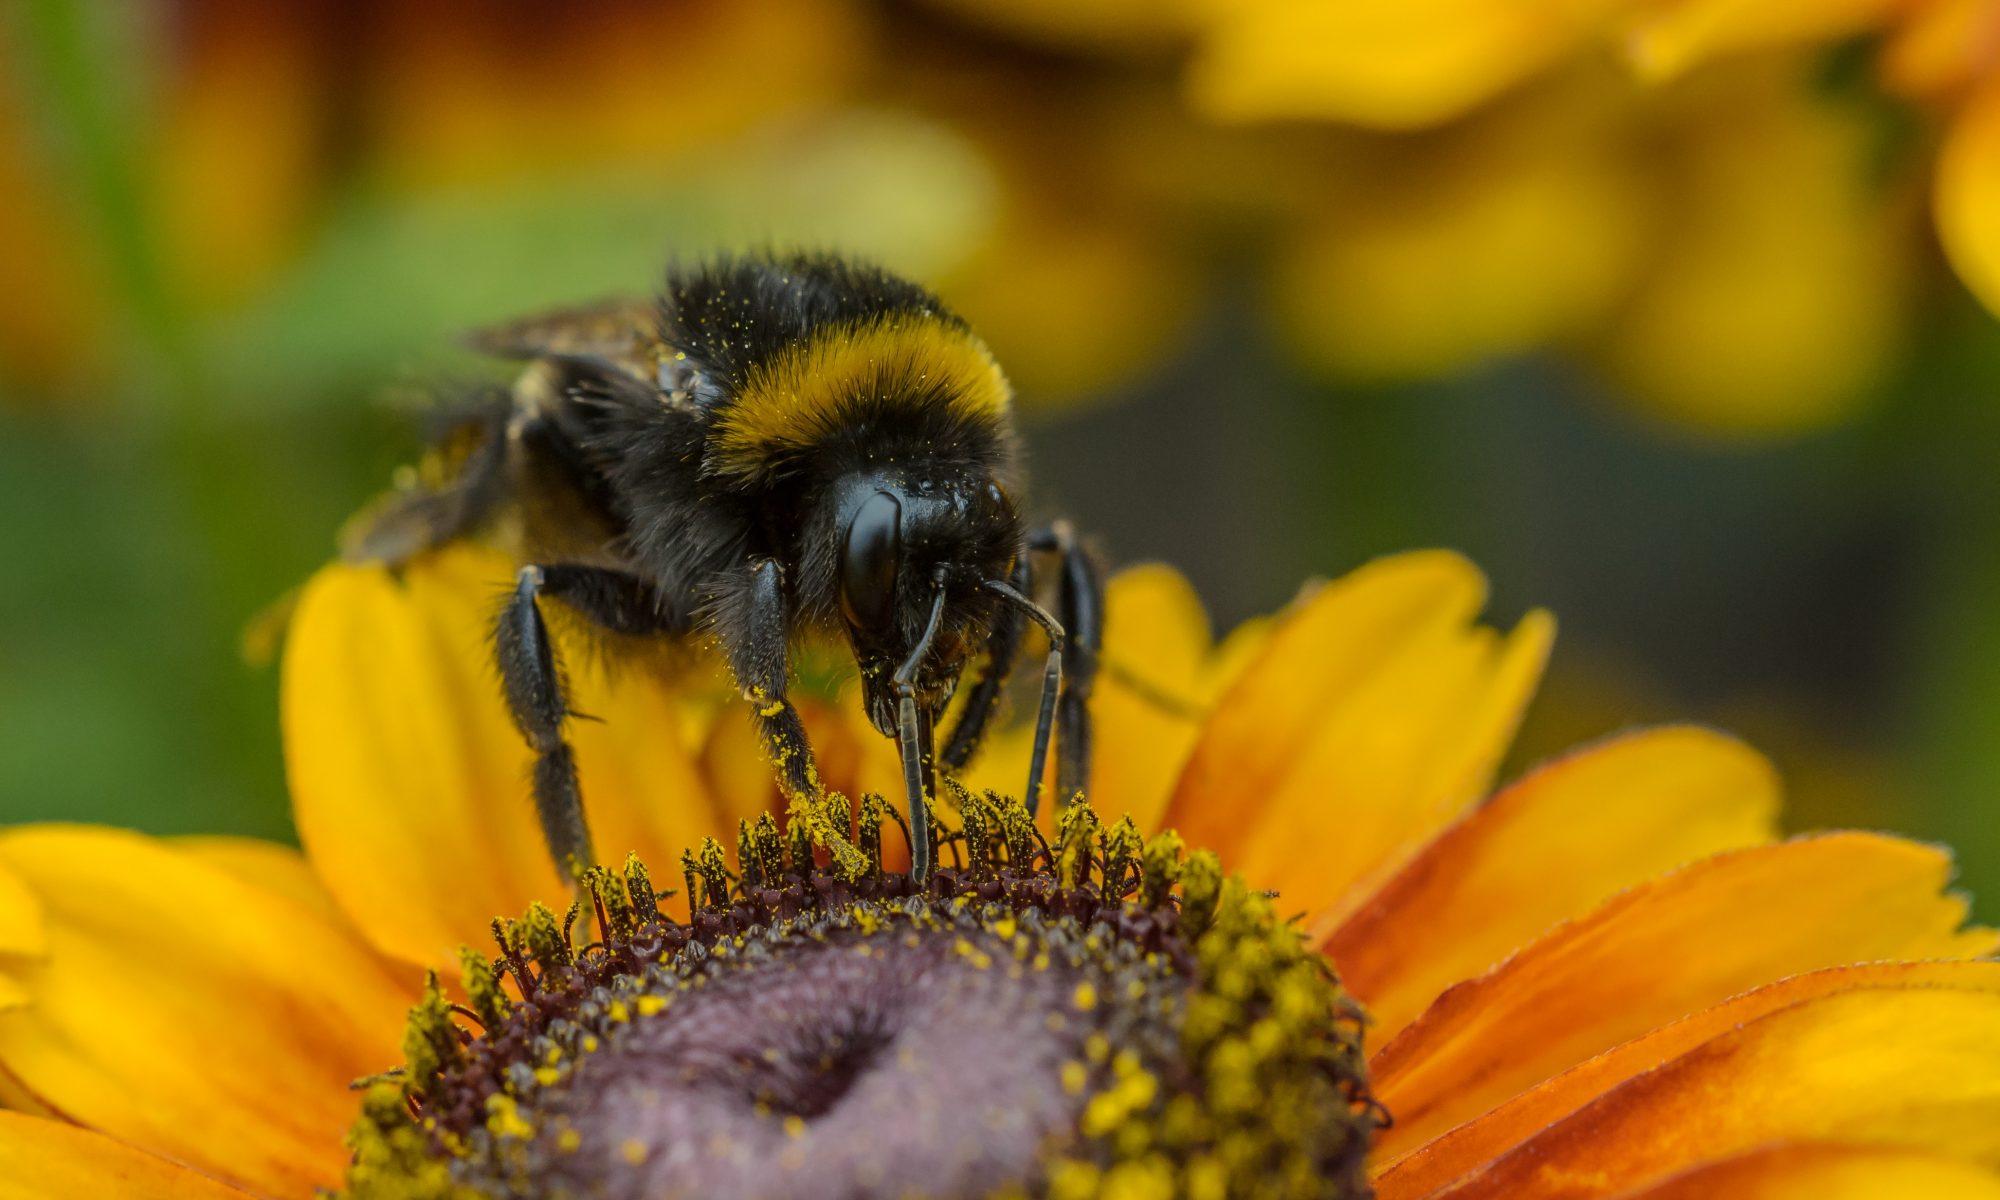 Bees Please